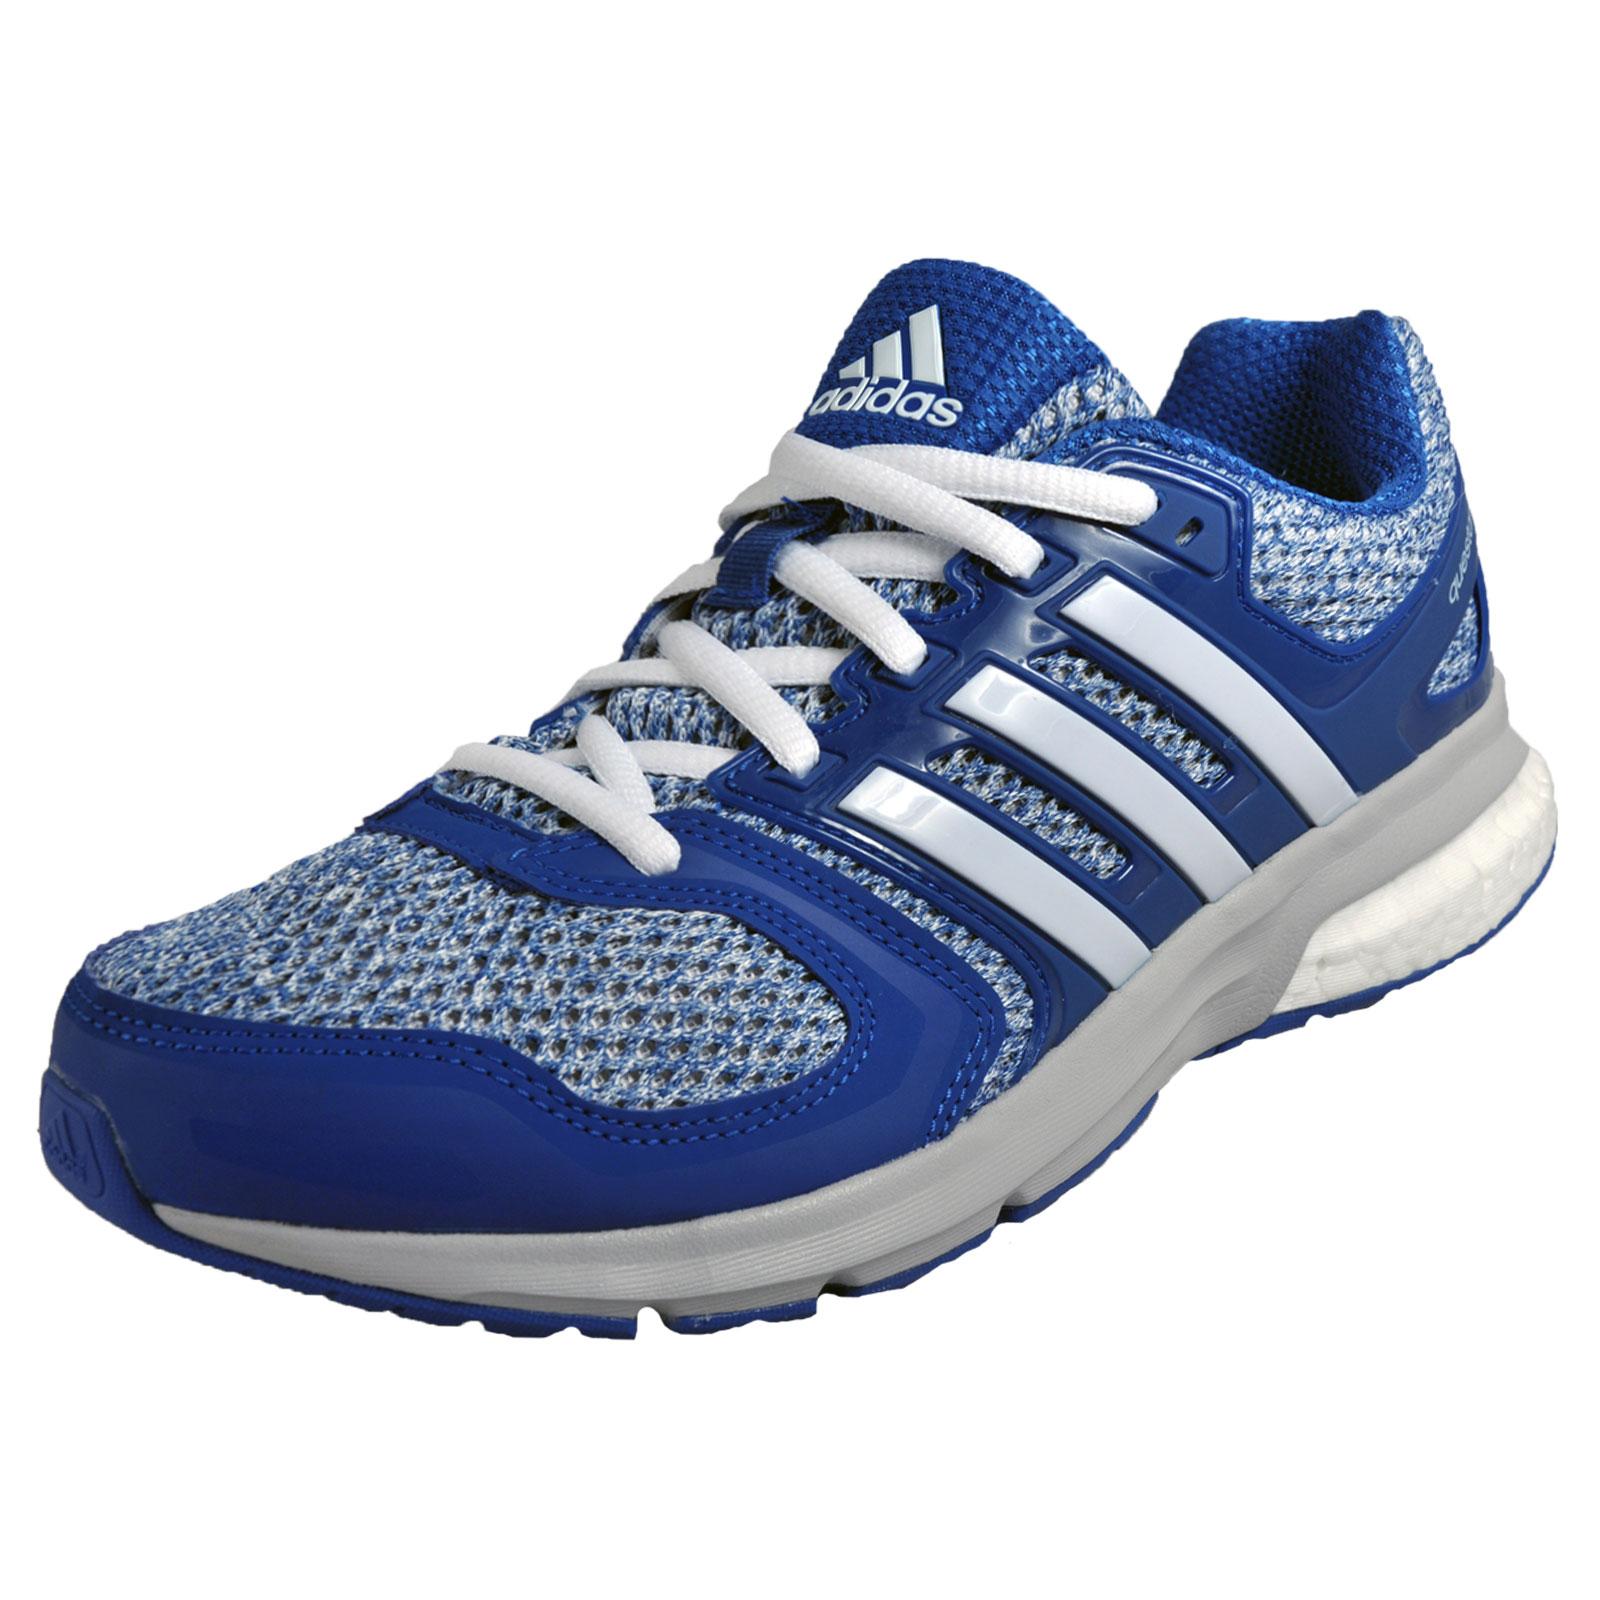 ADIDAS CC Sonic Da Uomo Premium Performance Scarpe Da Corsa Fitness da palestra scarpe da ginnastica Blue